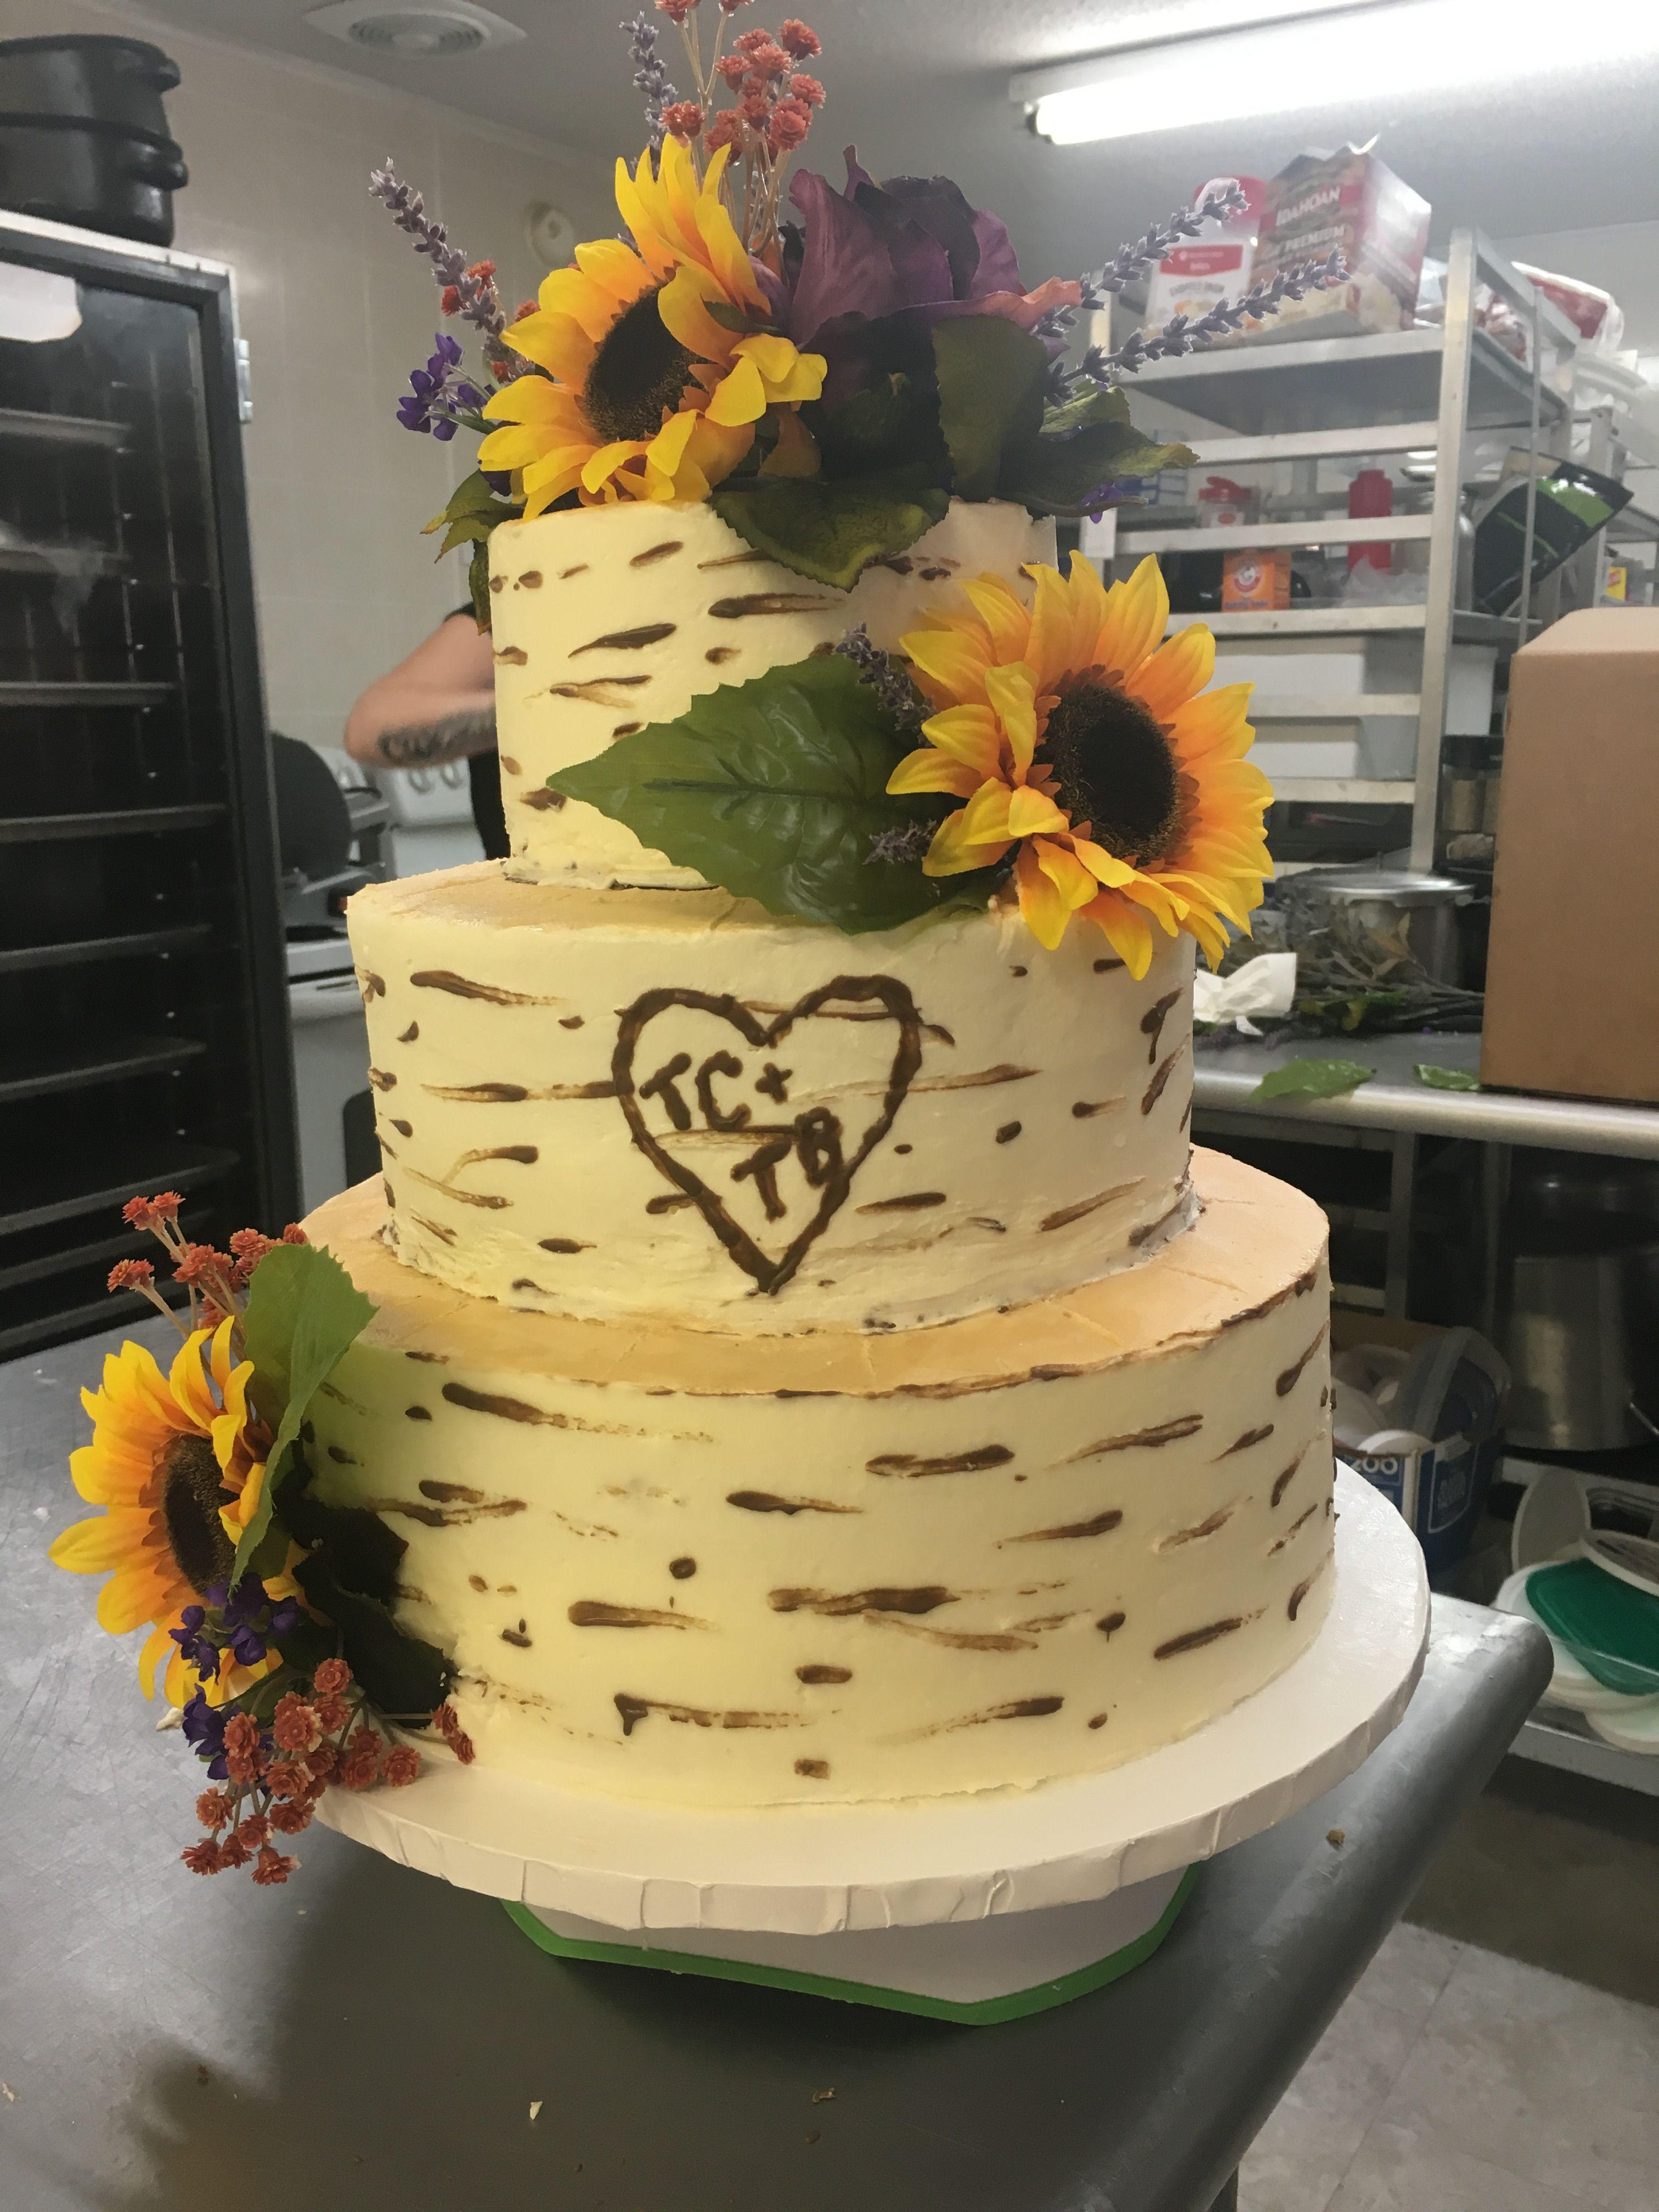 Three tier wedding cake, wood grain look, sunflowers